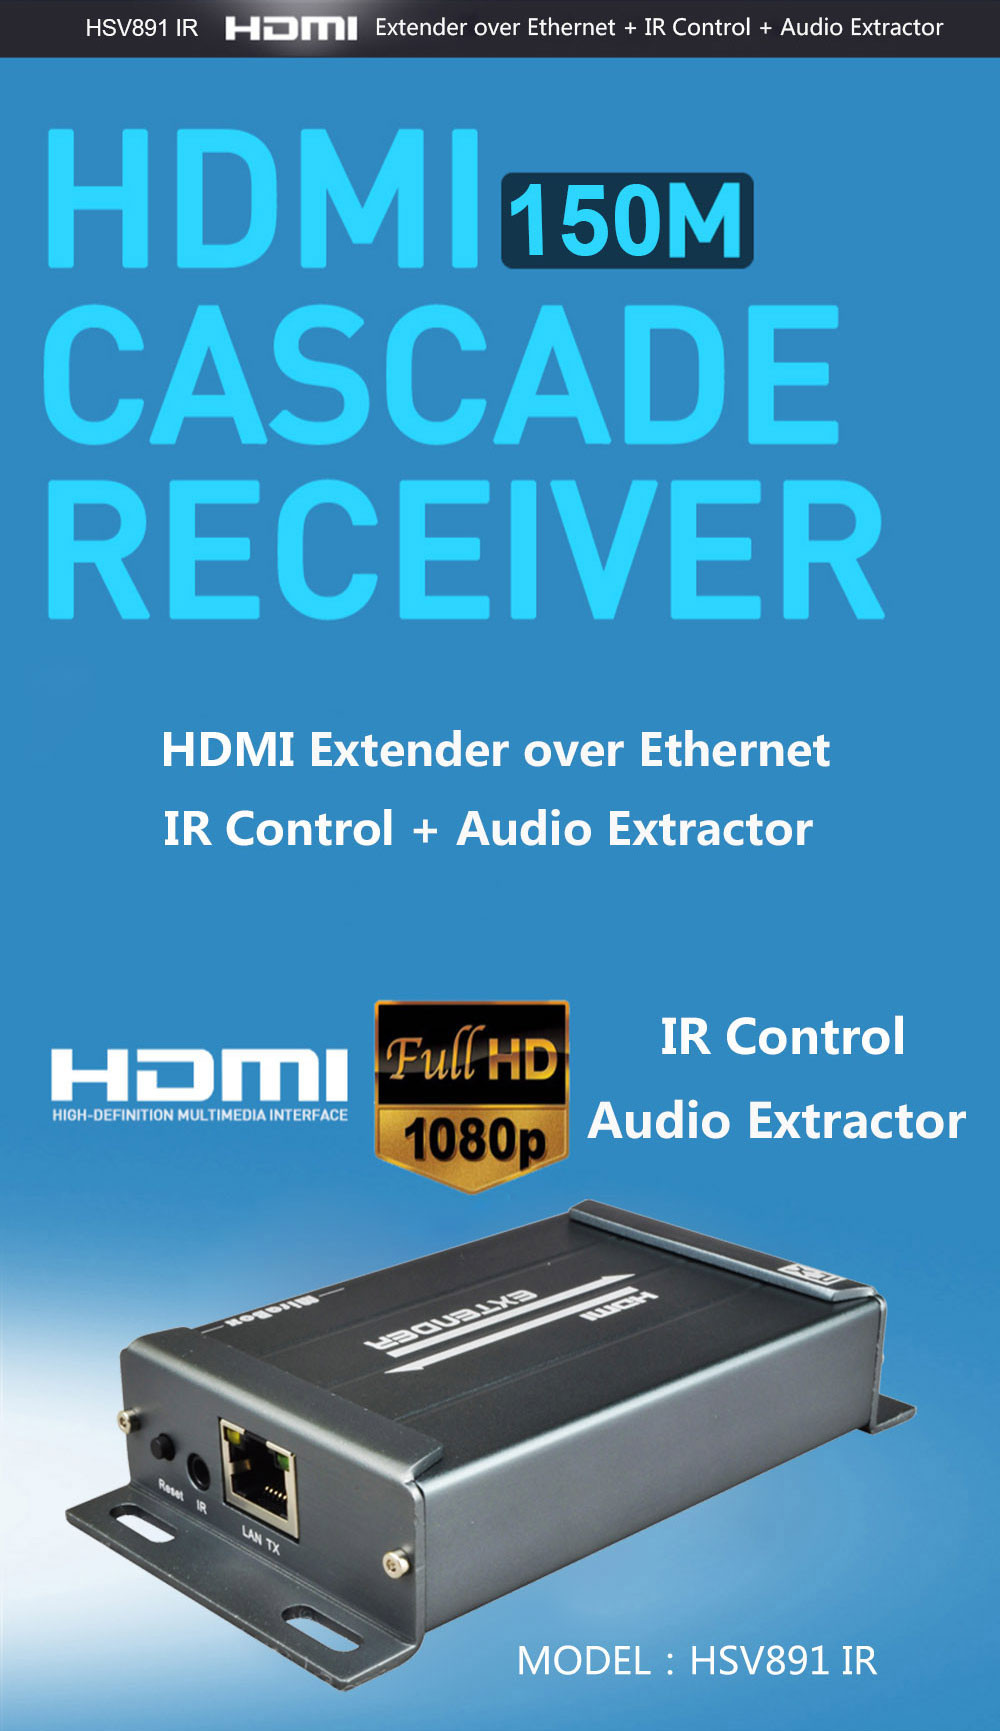 HDMI-EXTENDER-HSV891IR_02